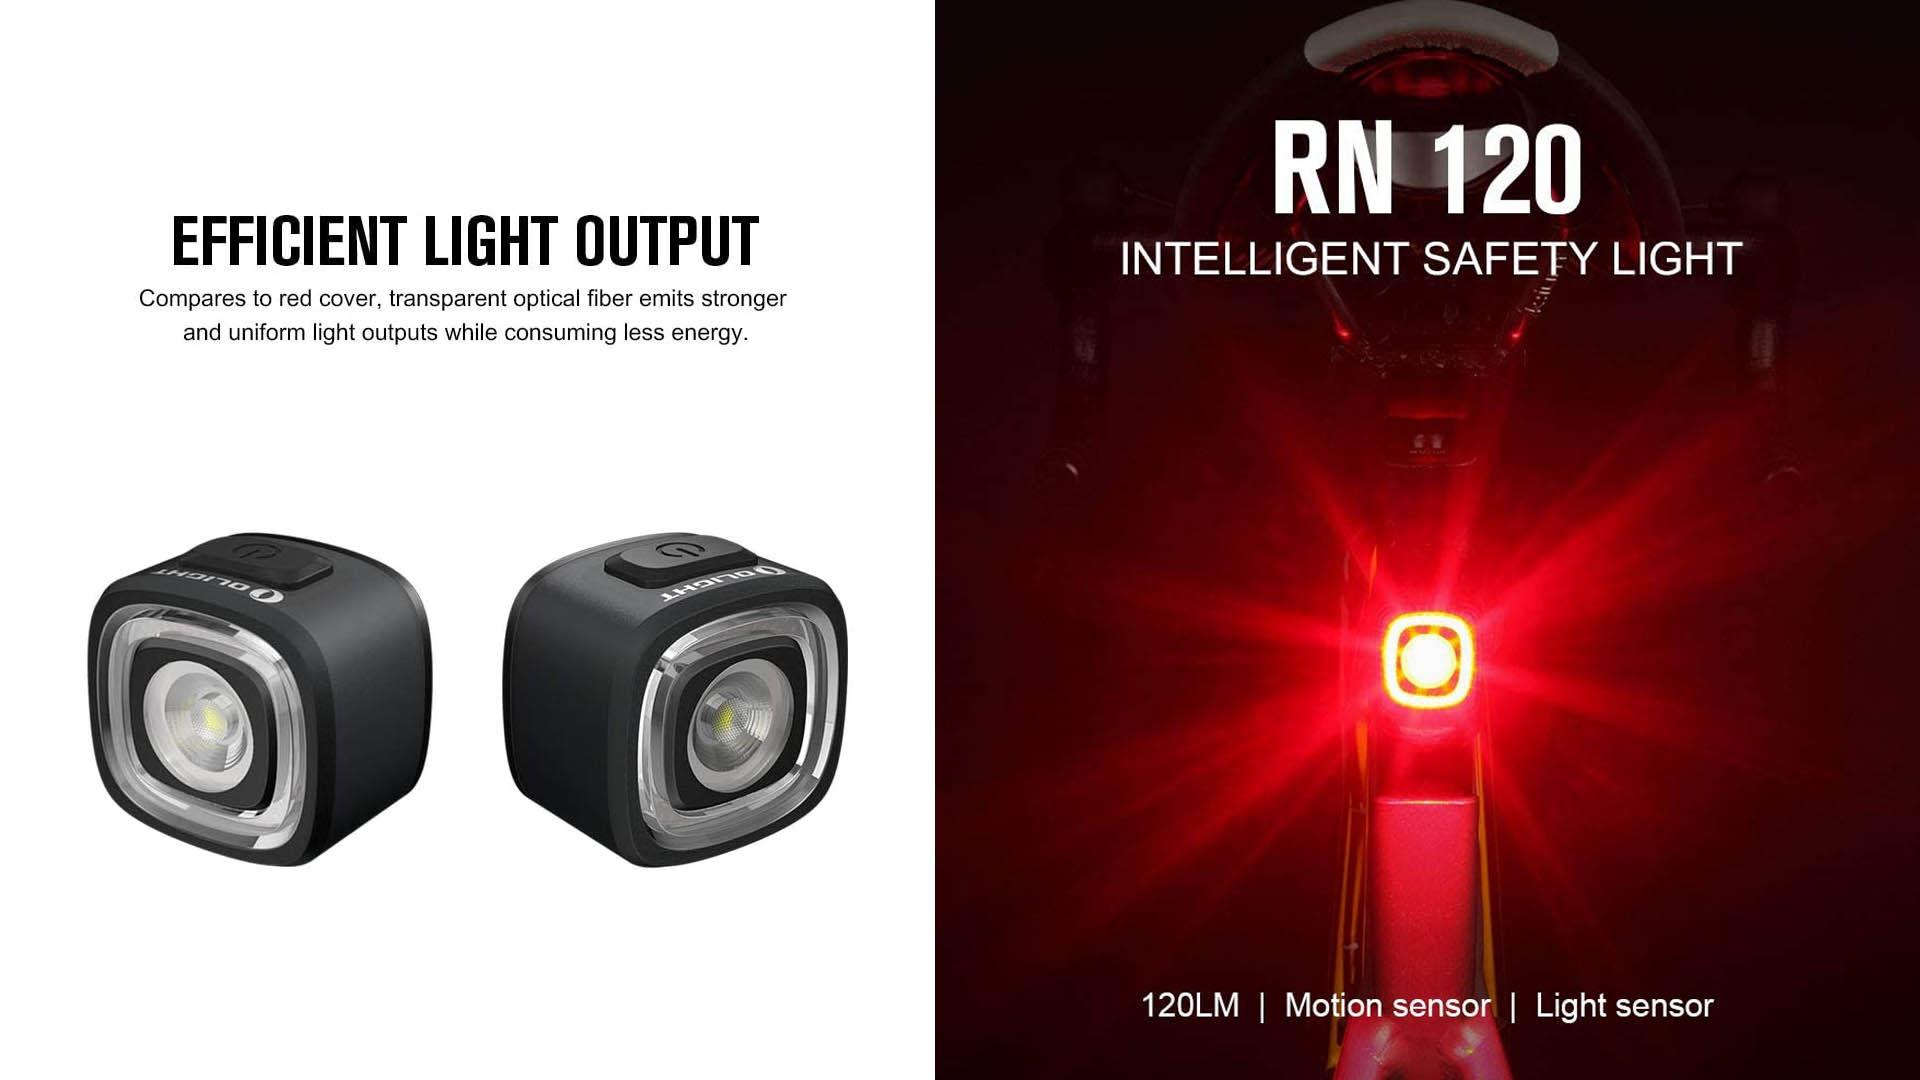 olight satefy light motion sensor